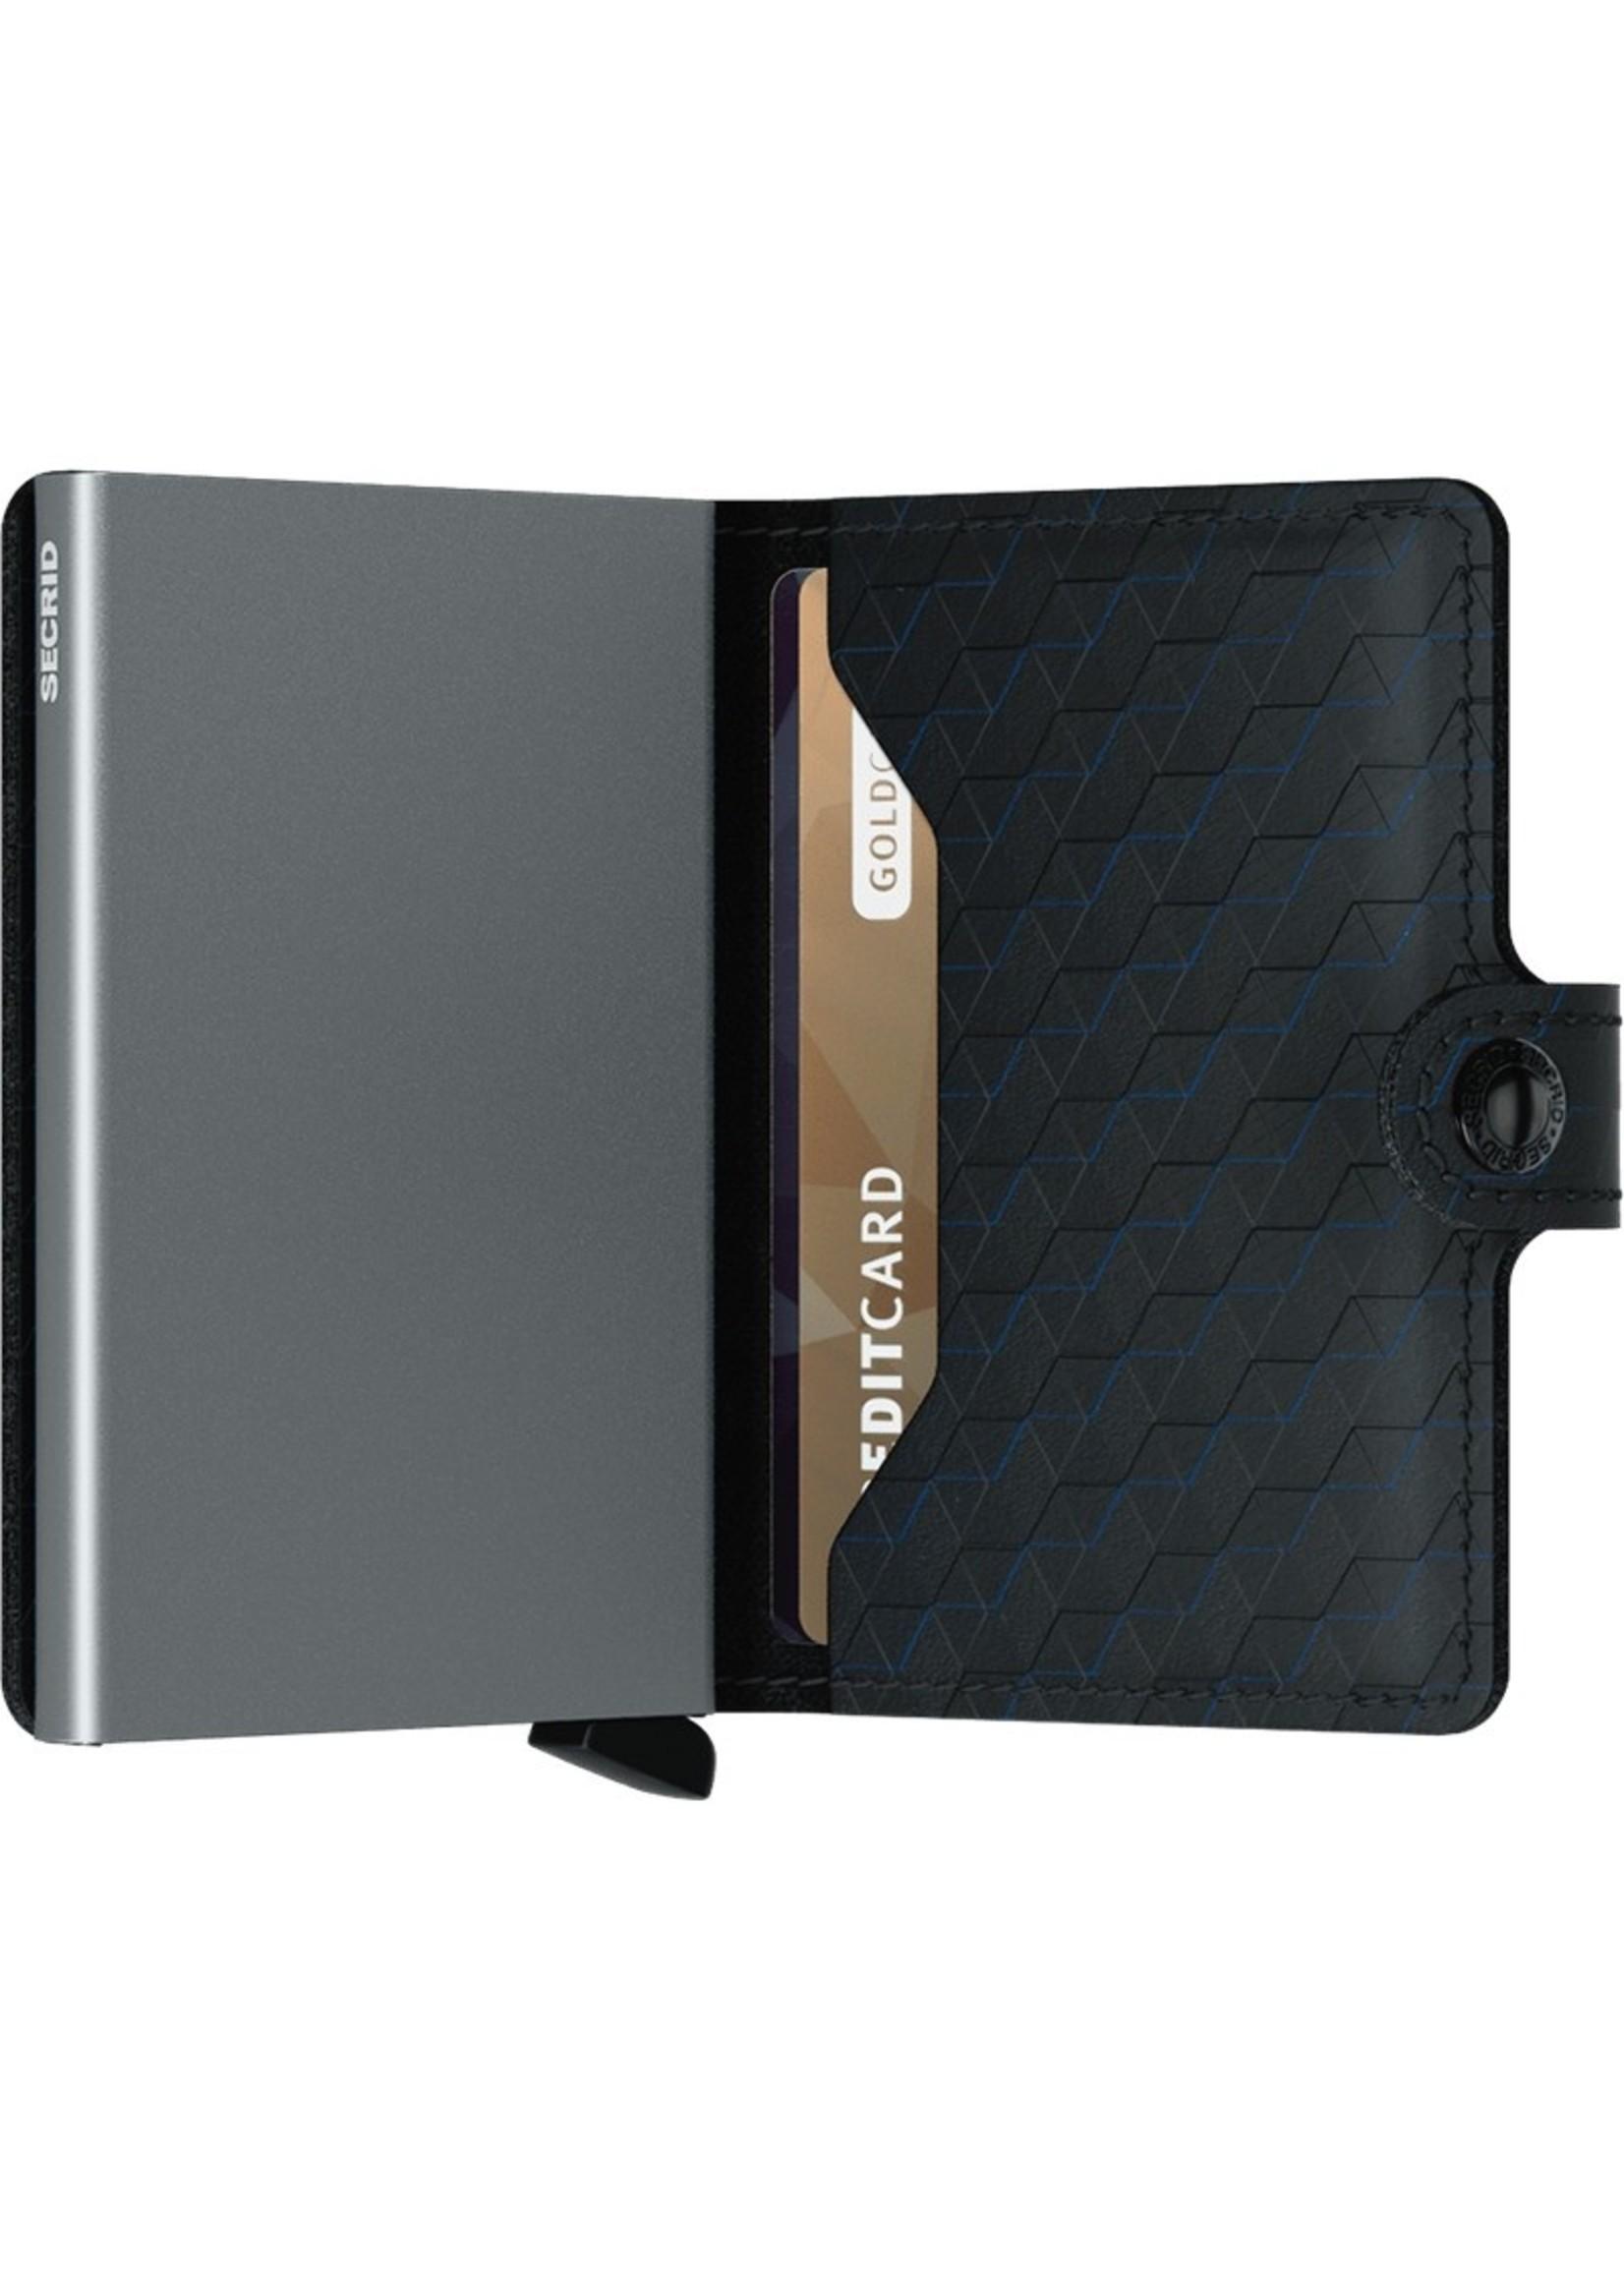 Secrid Wallets Miniwallet Optical Black-Titanium